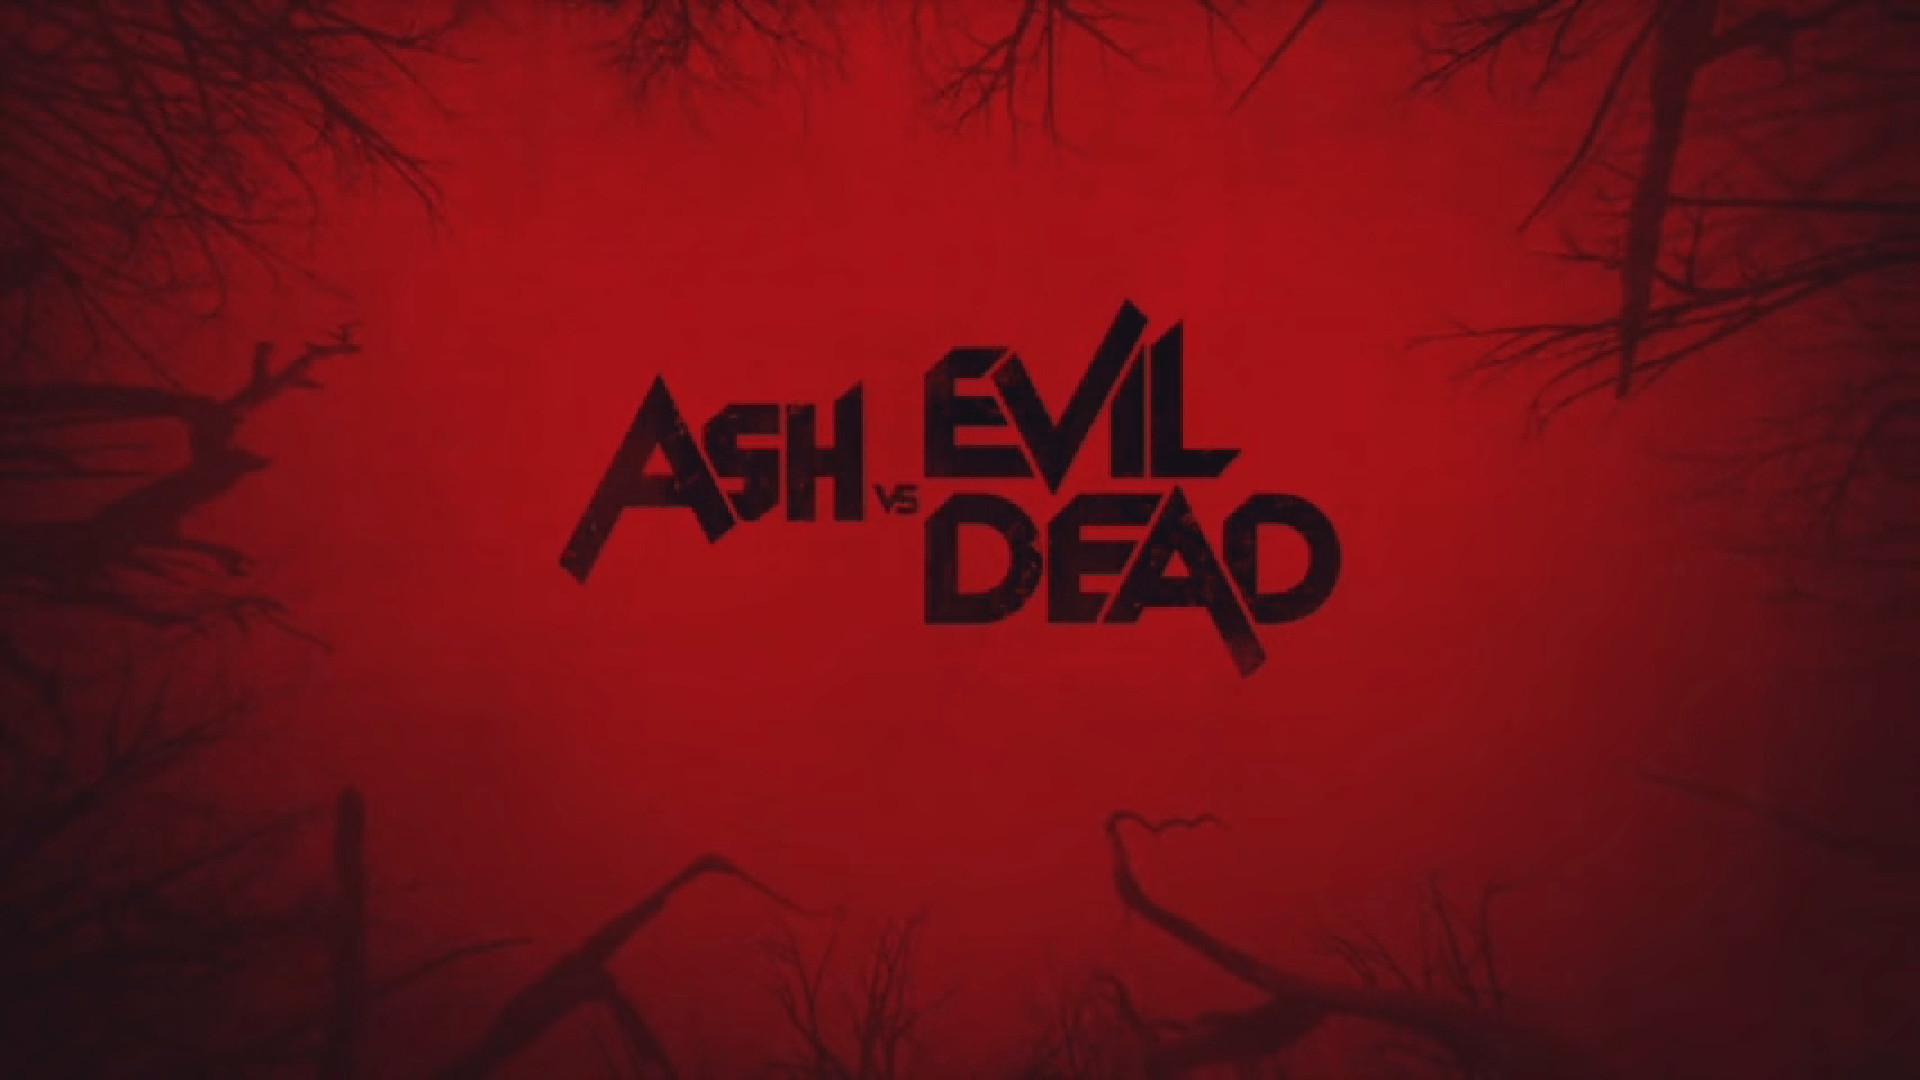 Ash Vs Evil Dead Wallpaper Posted By Ryan Walker